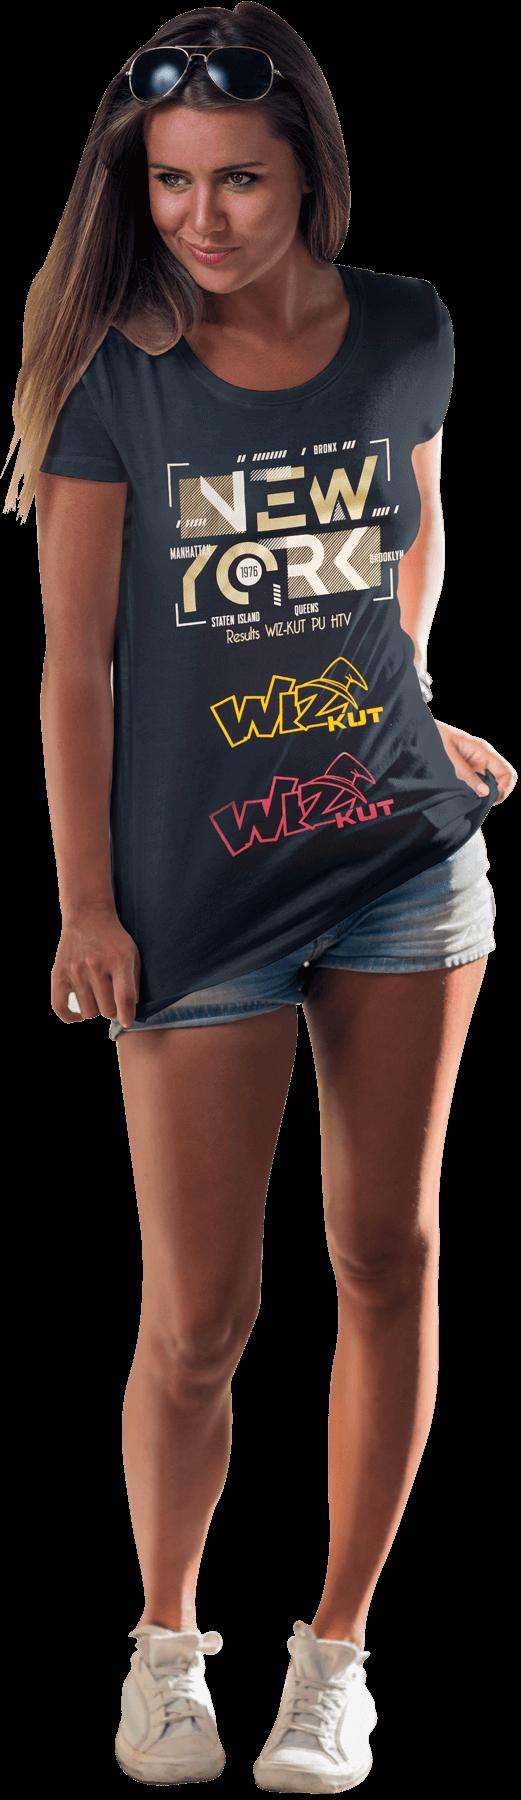 Results WIZ Kut img-7